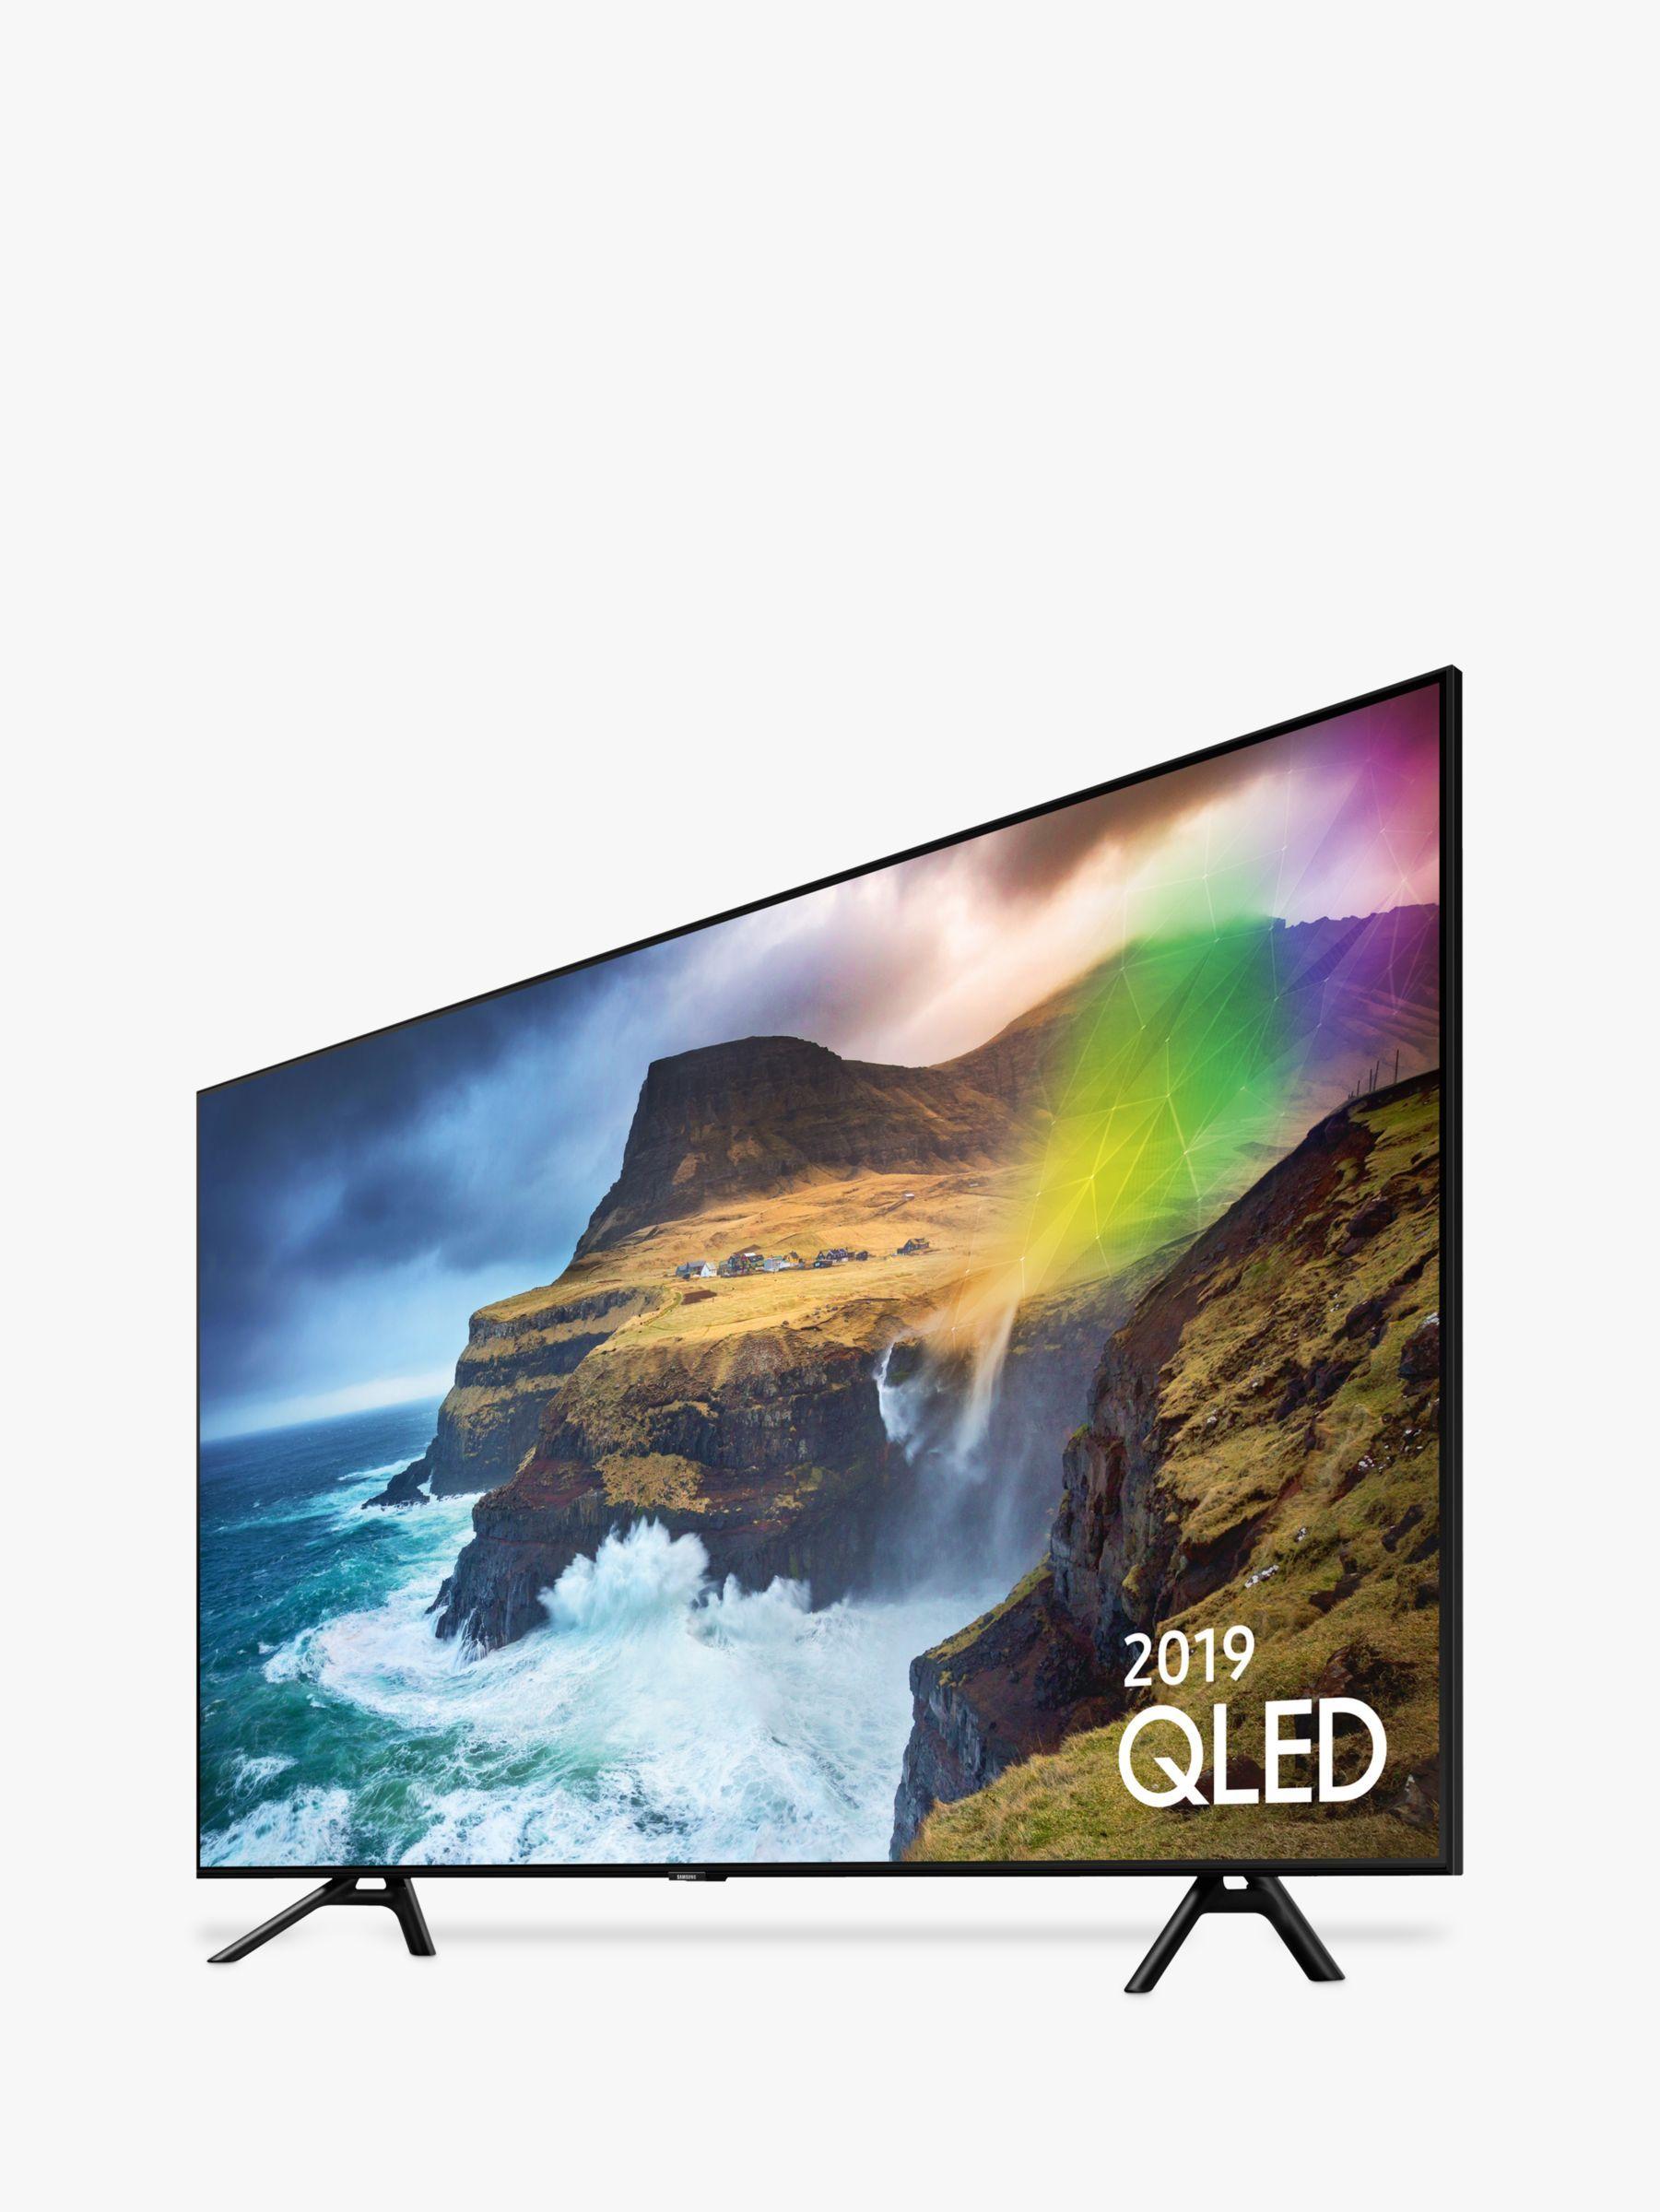 Samsung Qe55q70r 2019 Qled Hdr 1000 4k Ultra Hd Smart Tv 55